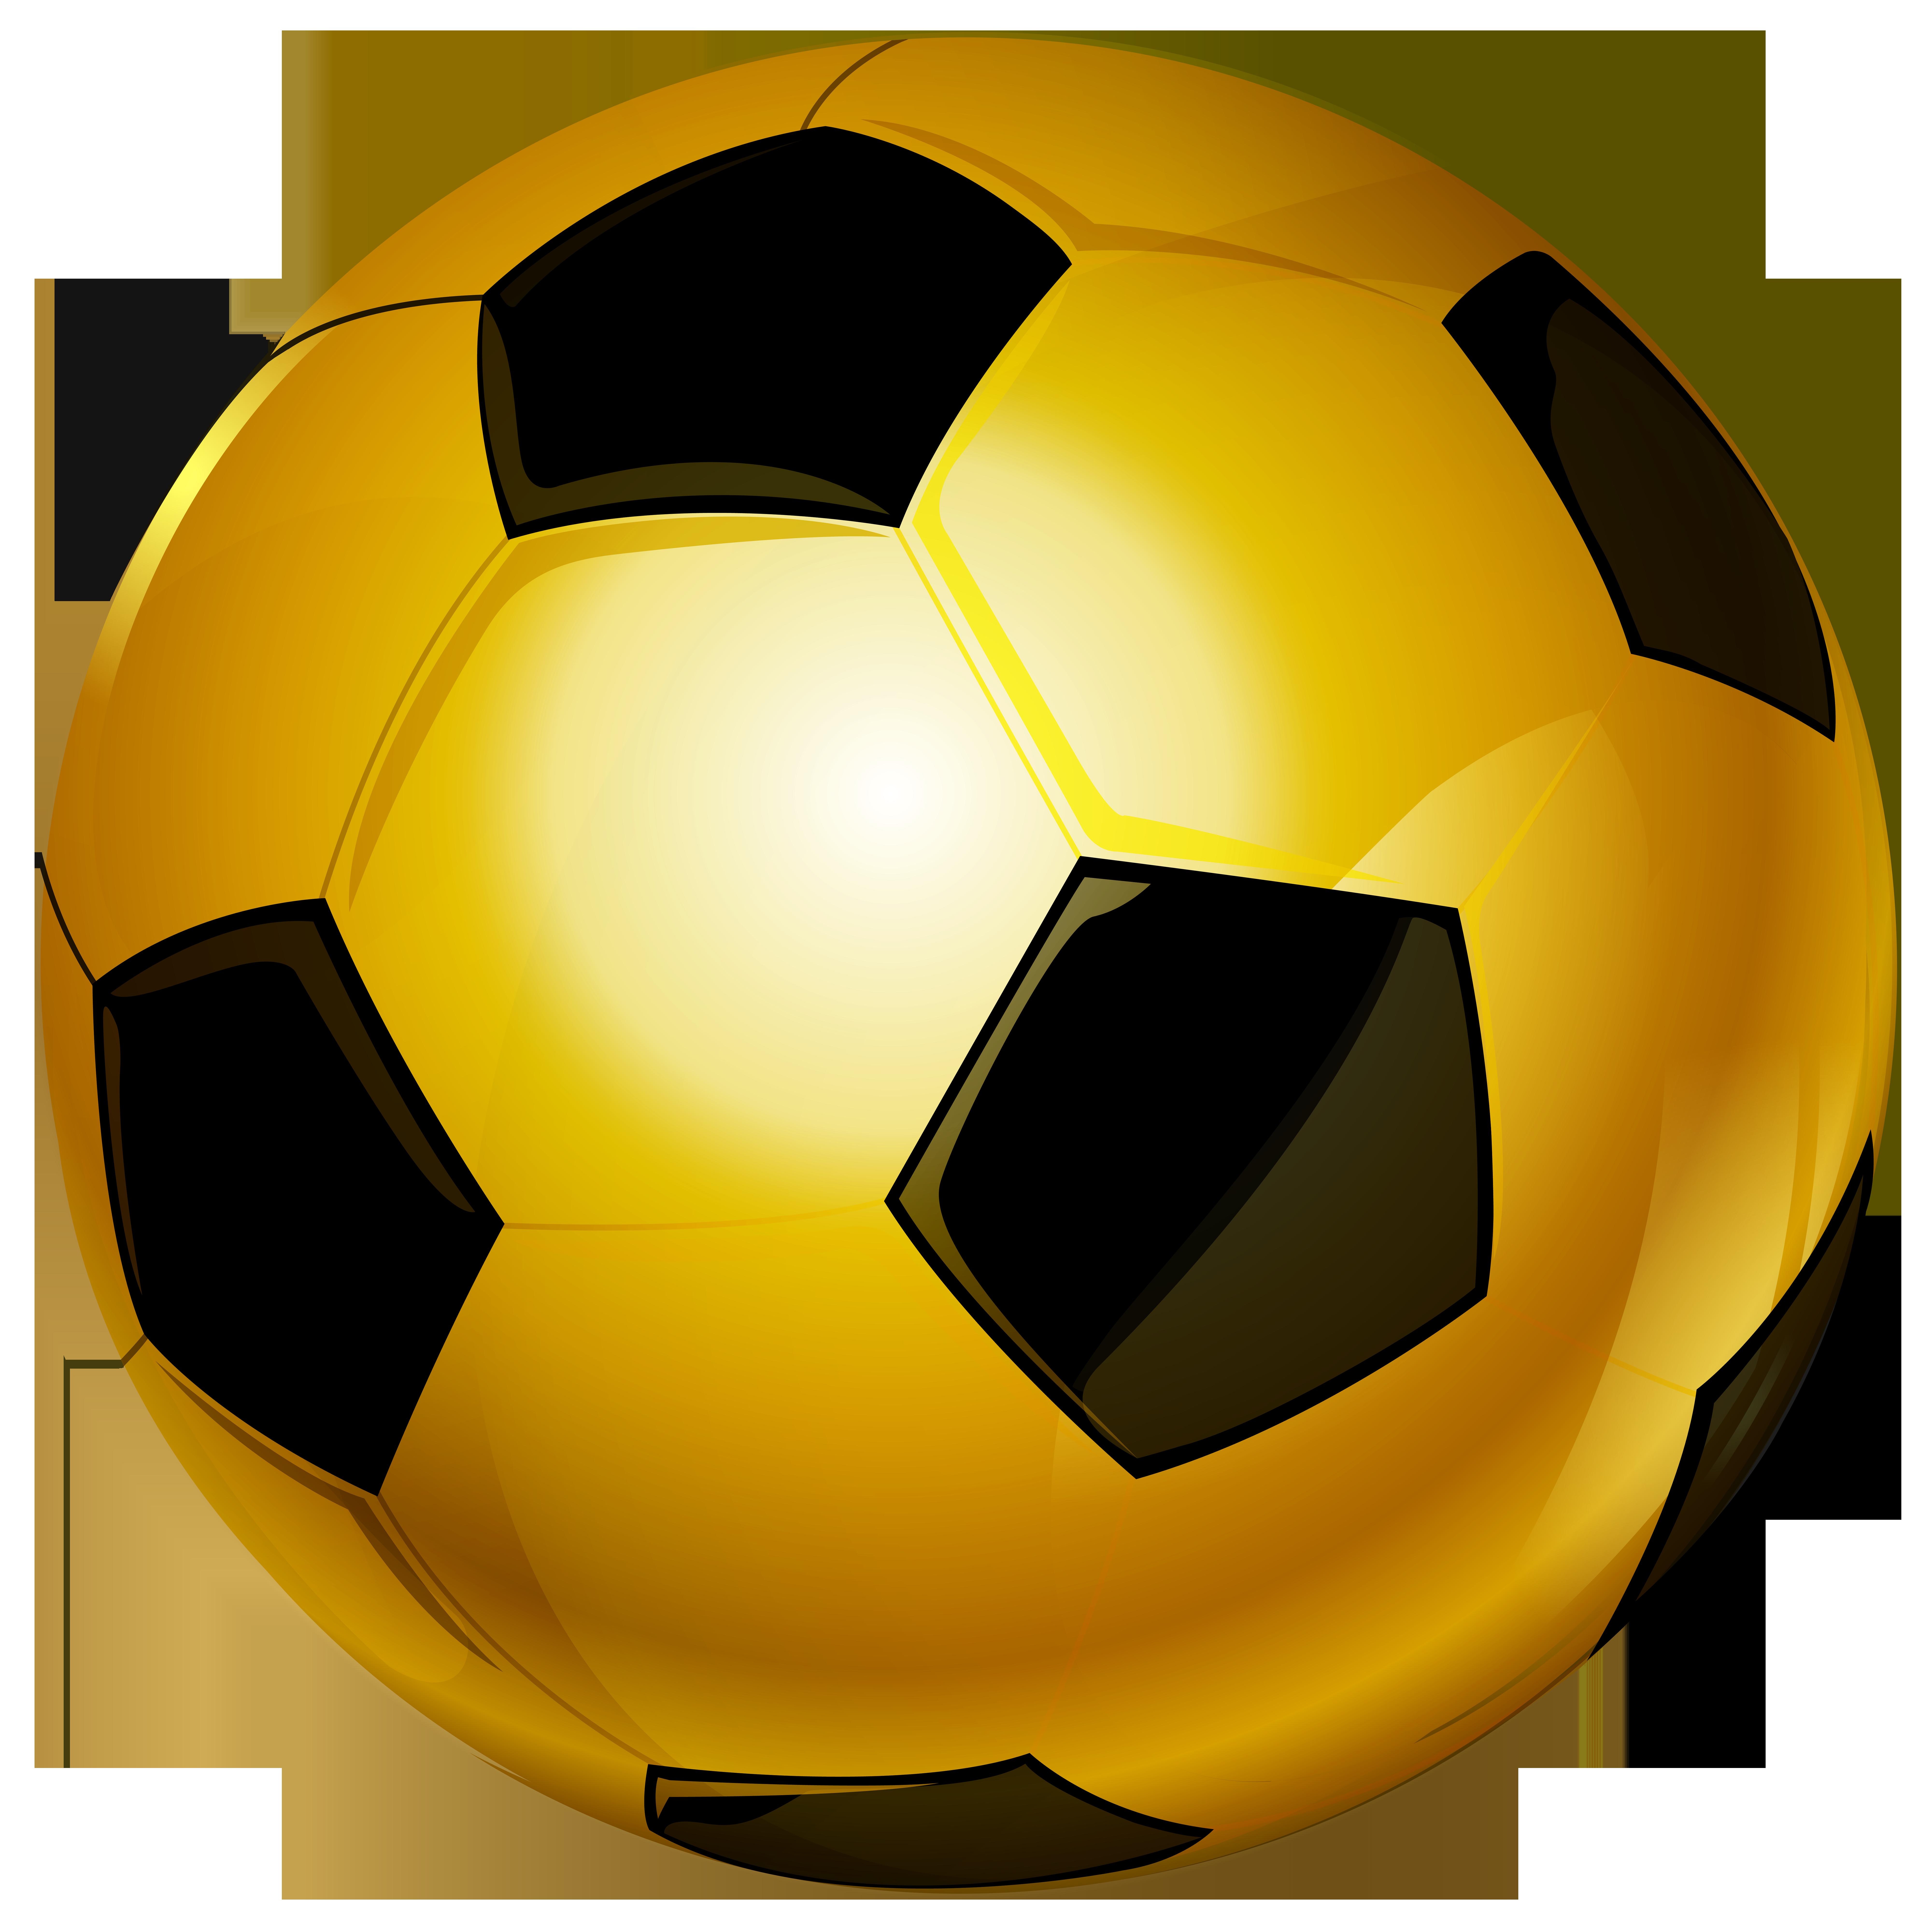 Chicken football clipart clip art black and white stock Football Clip art - Gold Soccer Ball PNG Clip Art Image 8000*7993 ... clip art black and white stock